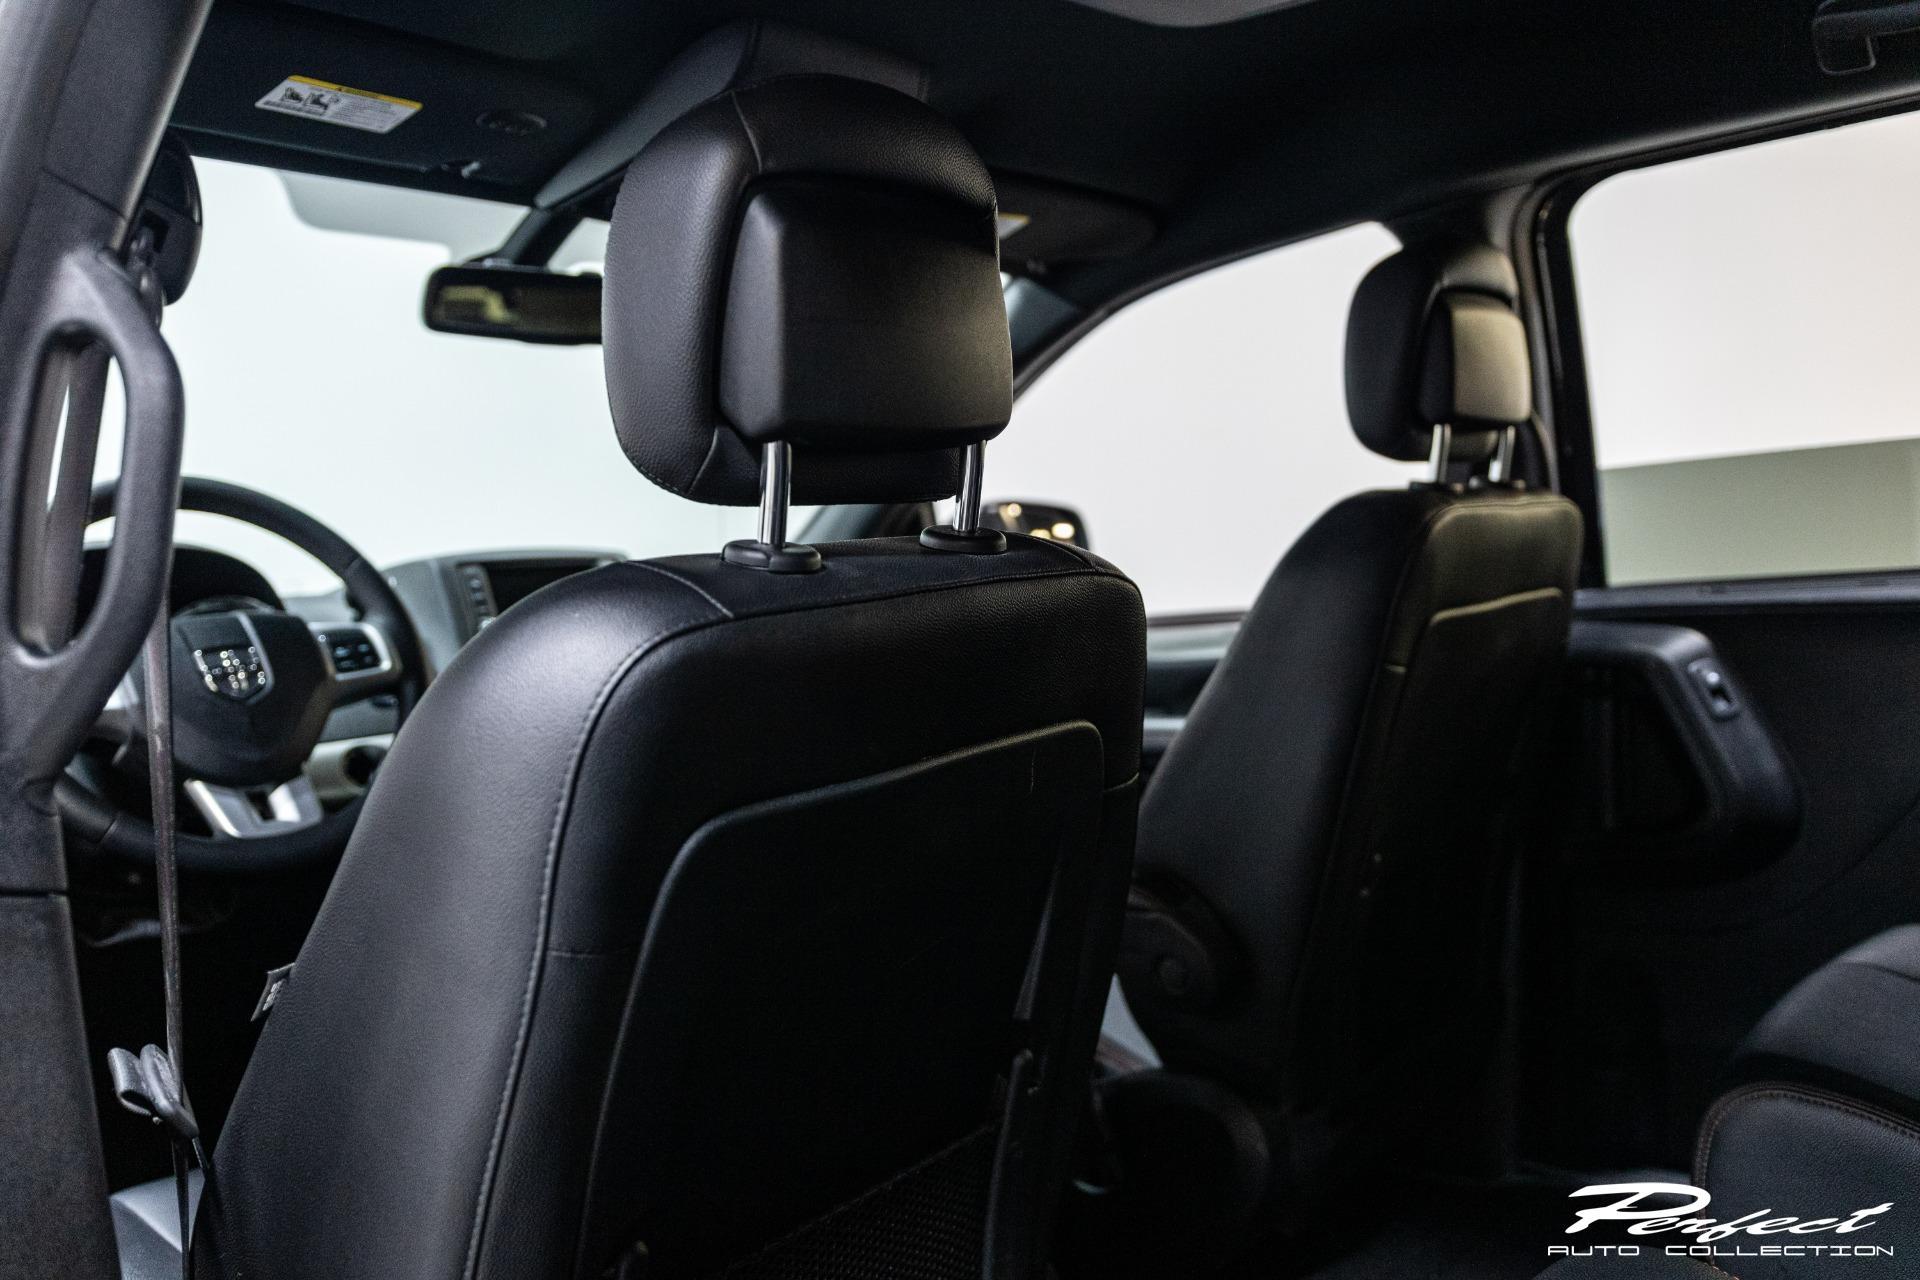 Used 2019 Dodge Grand Caravan Passenger GT Minivan 4D